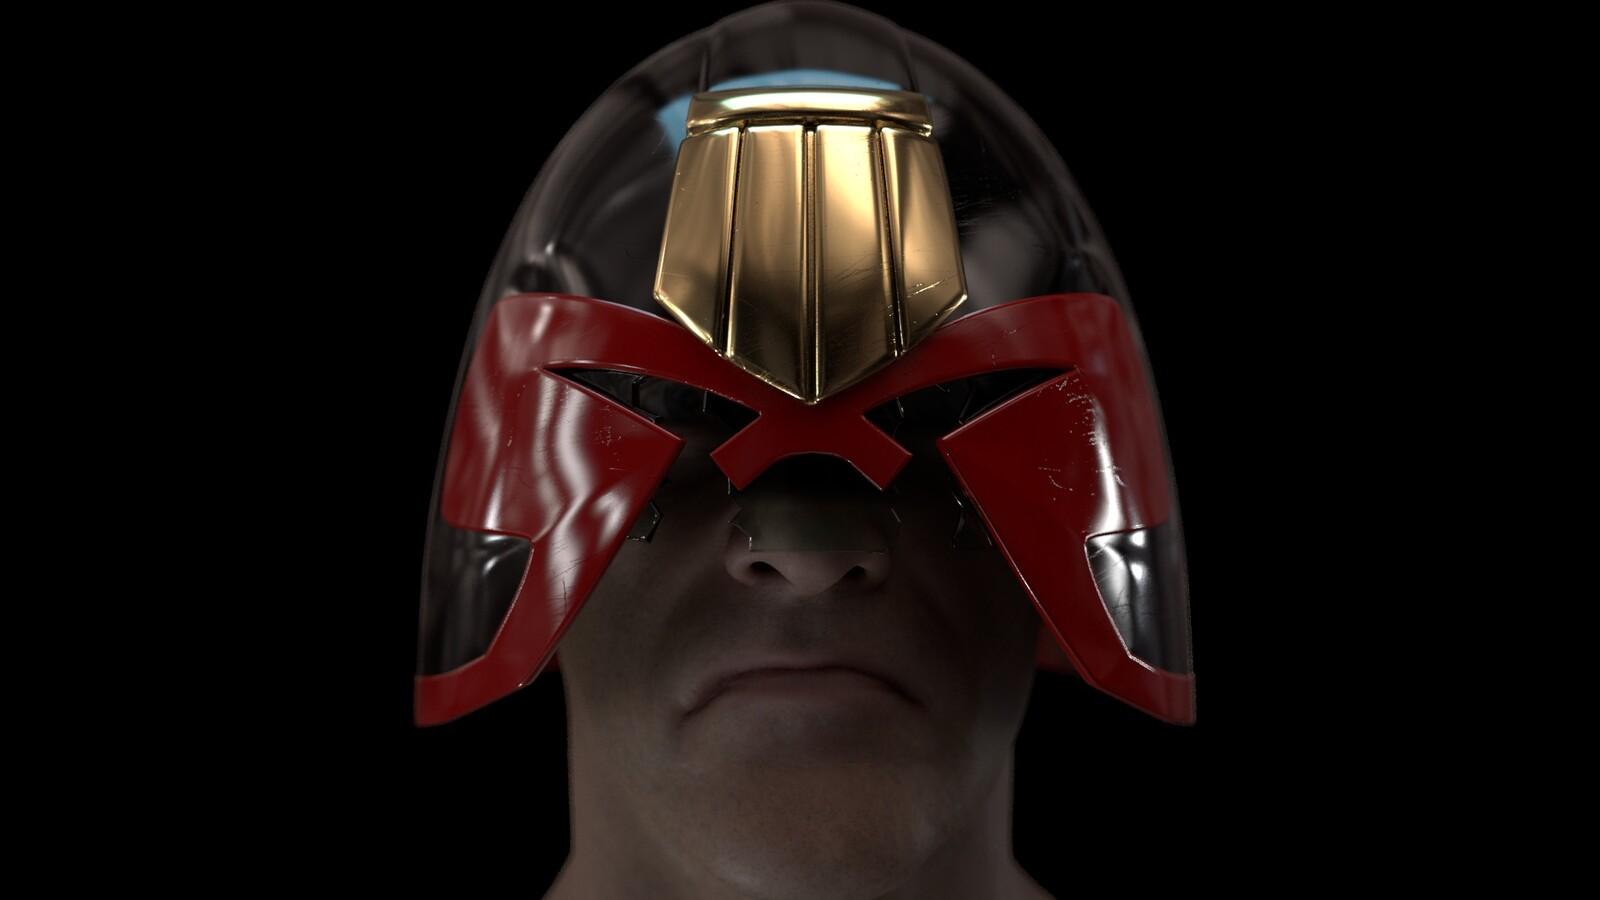 Ian Gibson Dredd Helmet